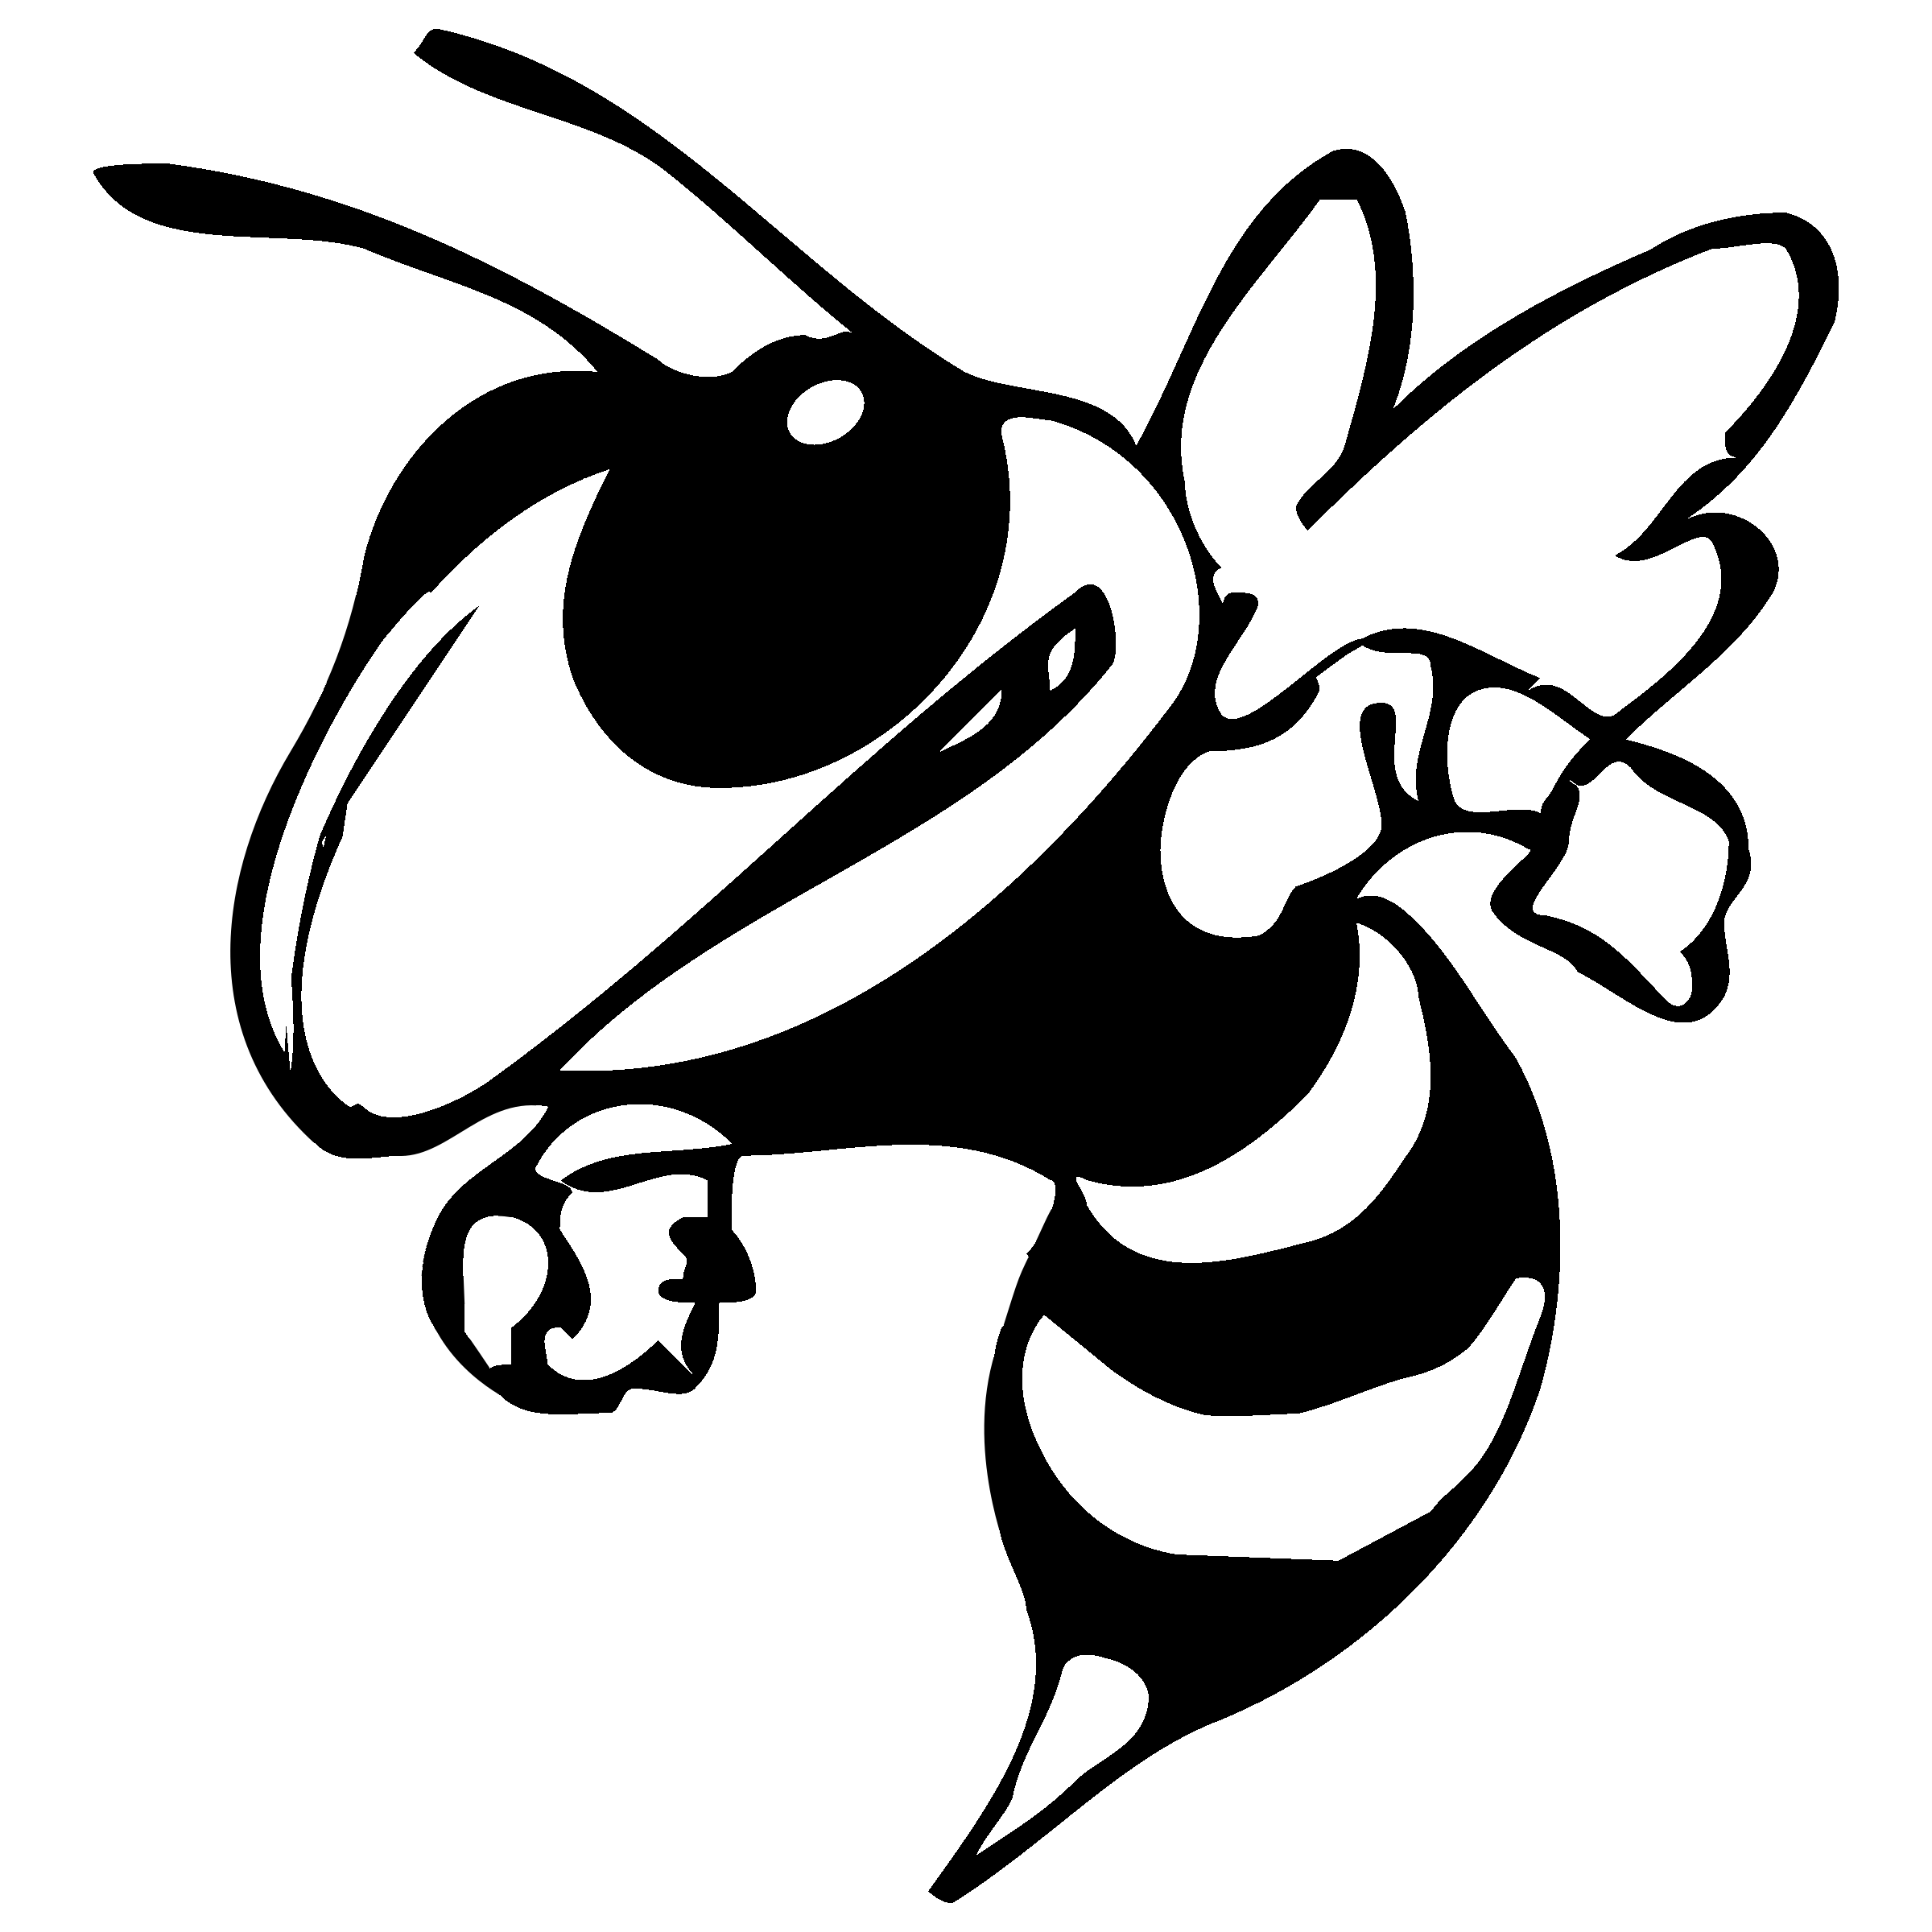 Black and white georgia tech football team clipart clipart transparent download Hornet clipart georgia tech, Hornet georgia tech Transparent FREE ... clipart transparent download